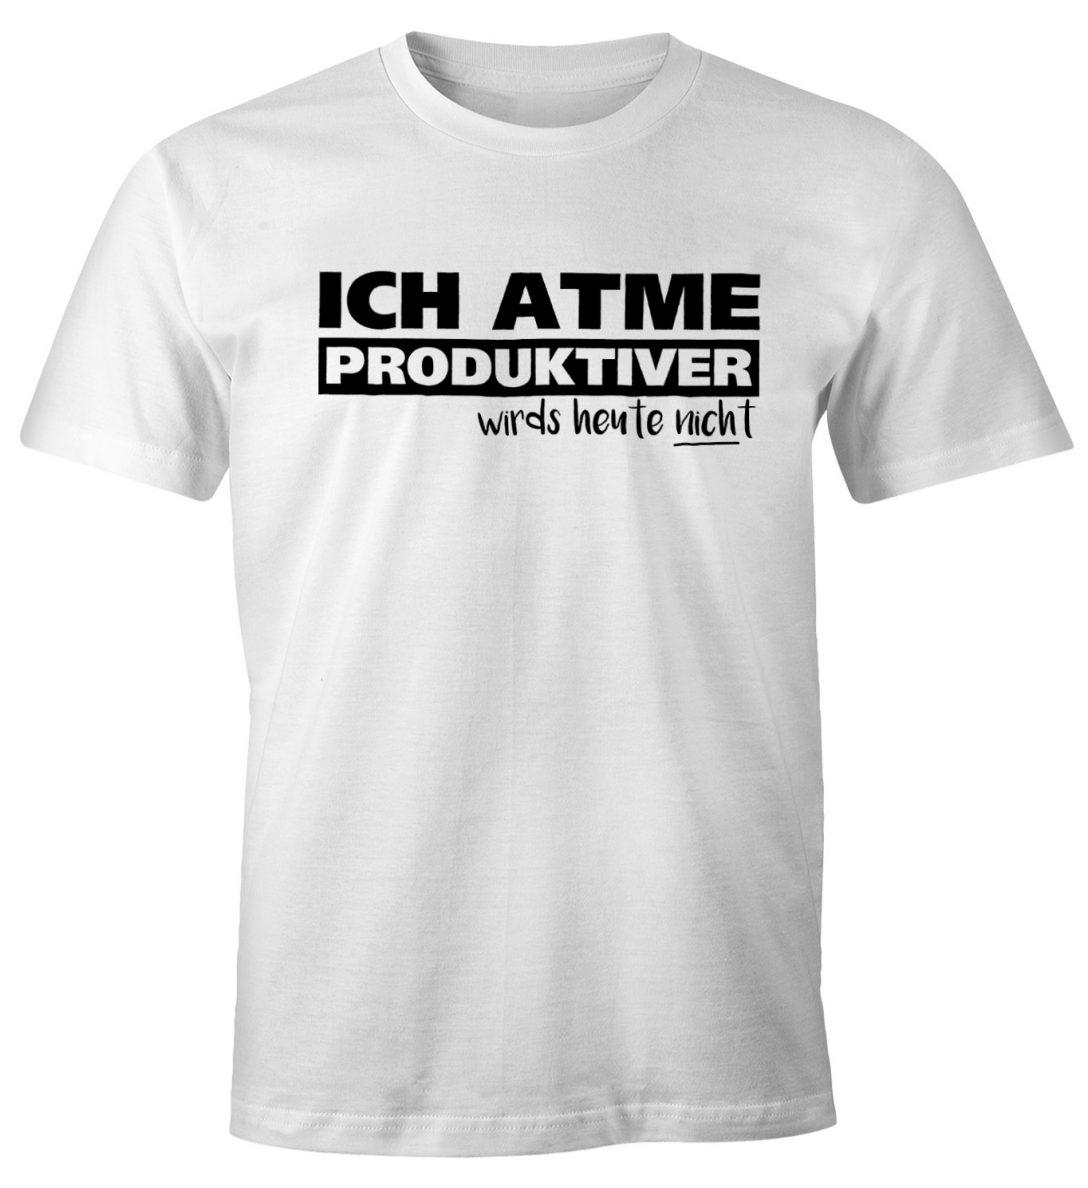 Large Size of Bud Spencer Sprüche T Shirt Sprüche T Shirt Urheberrecht Junggesellen Sprüche T Shirt Bayerische Sprüche T Shirt Küche Sprüche T Shirt